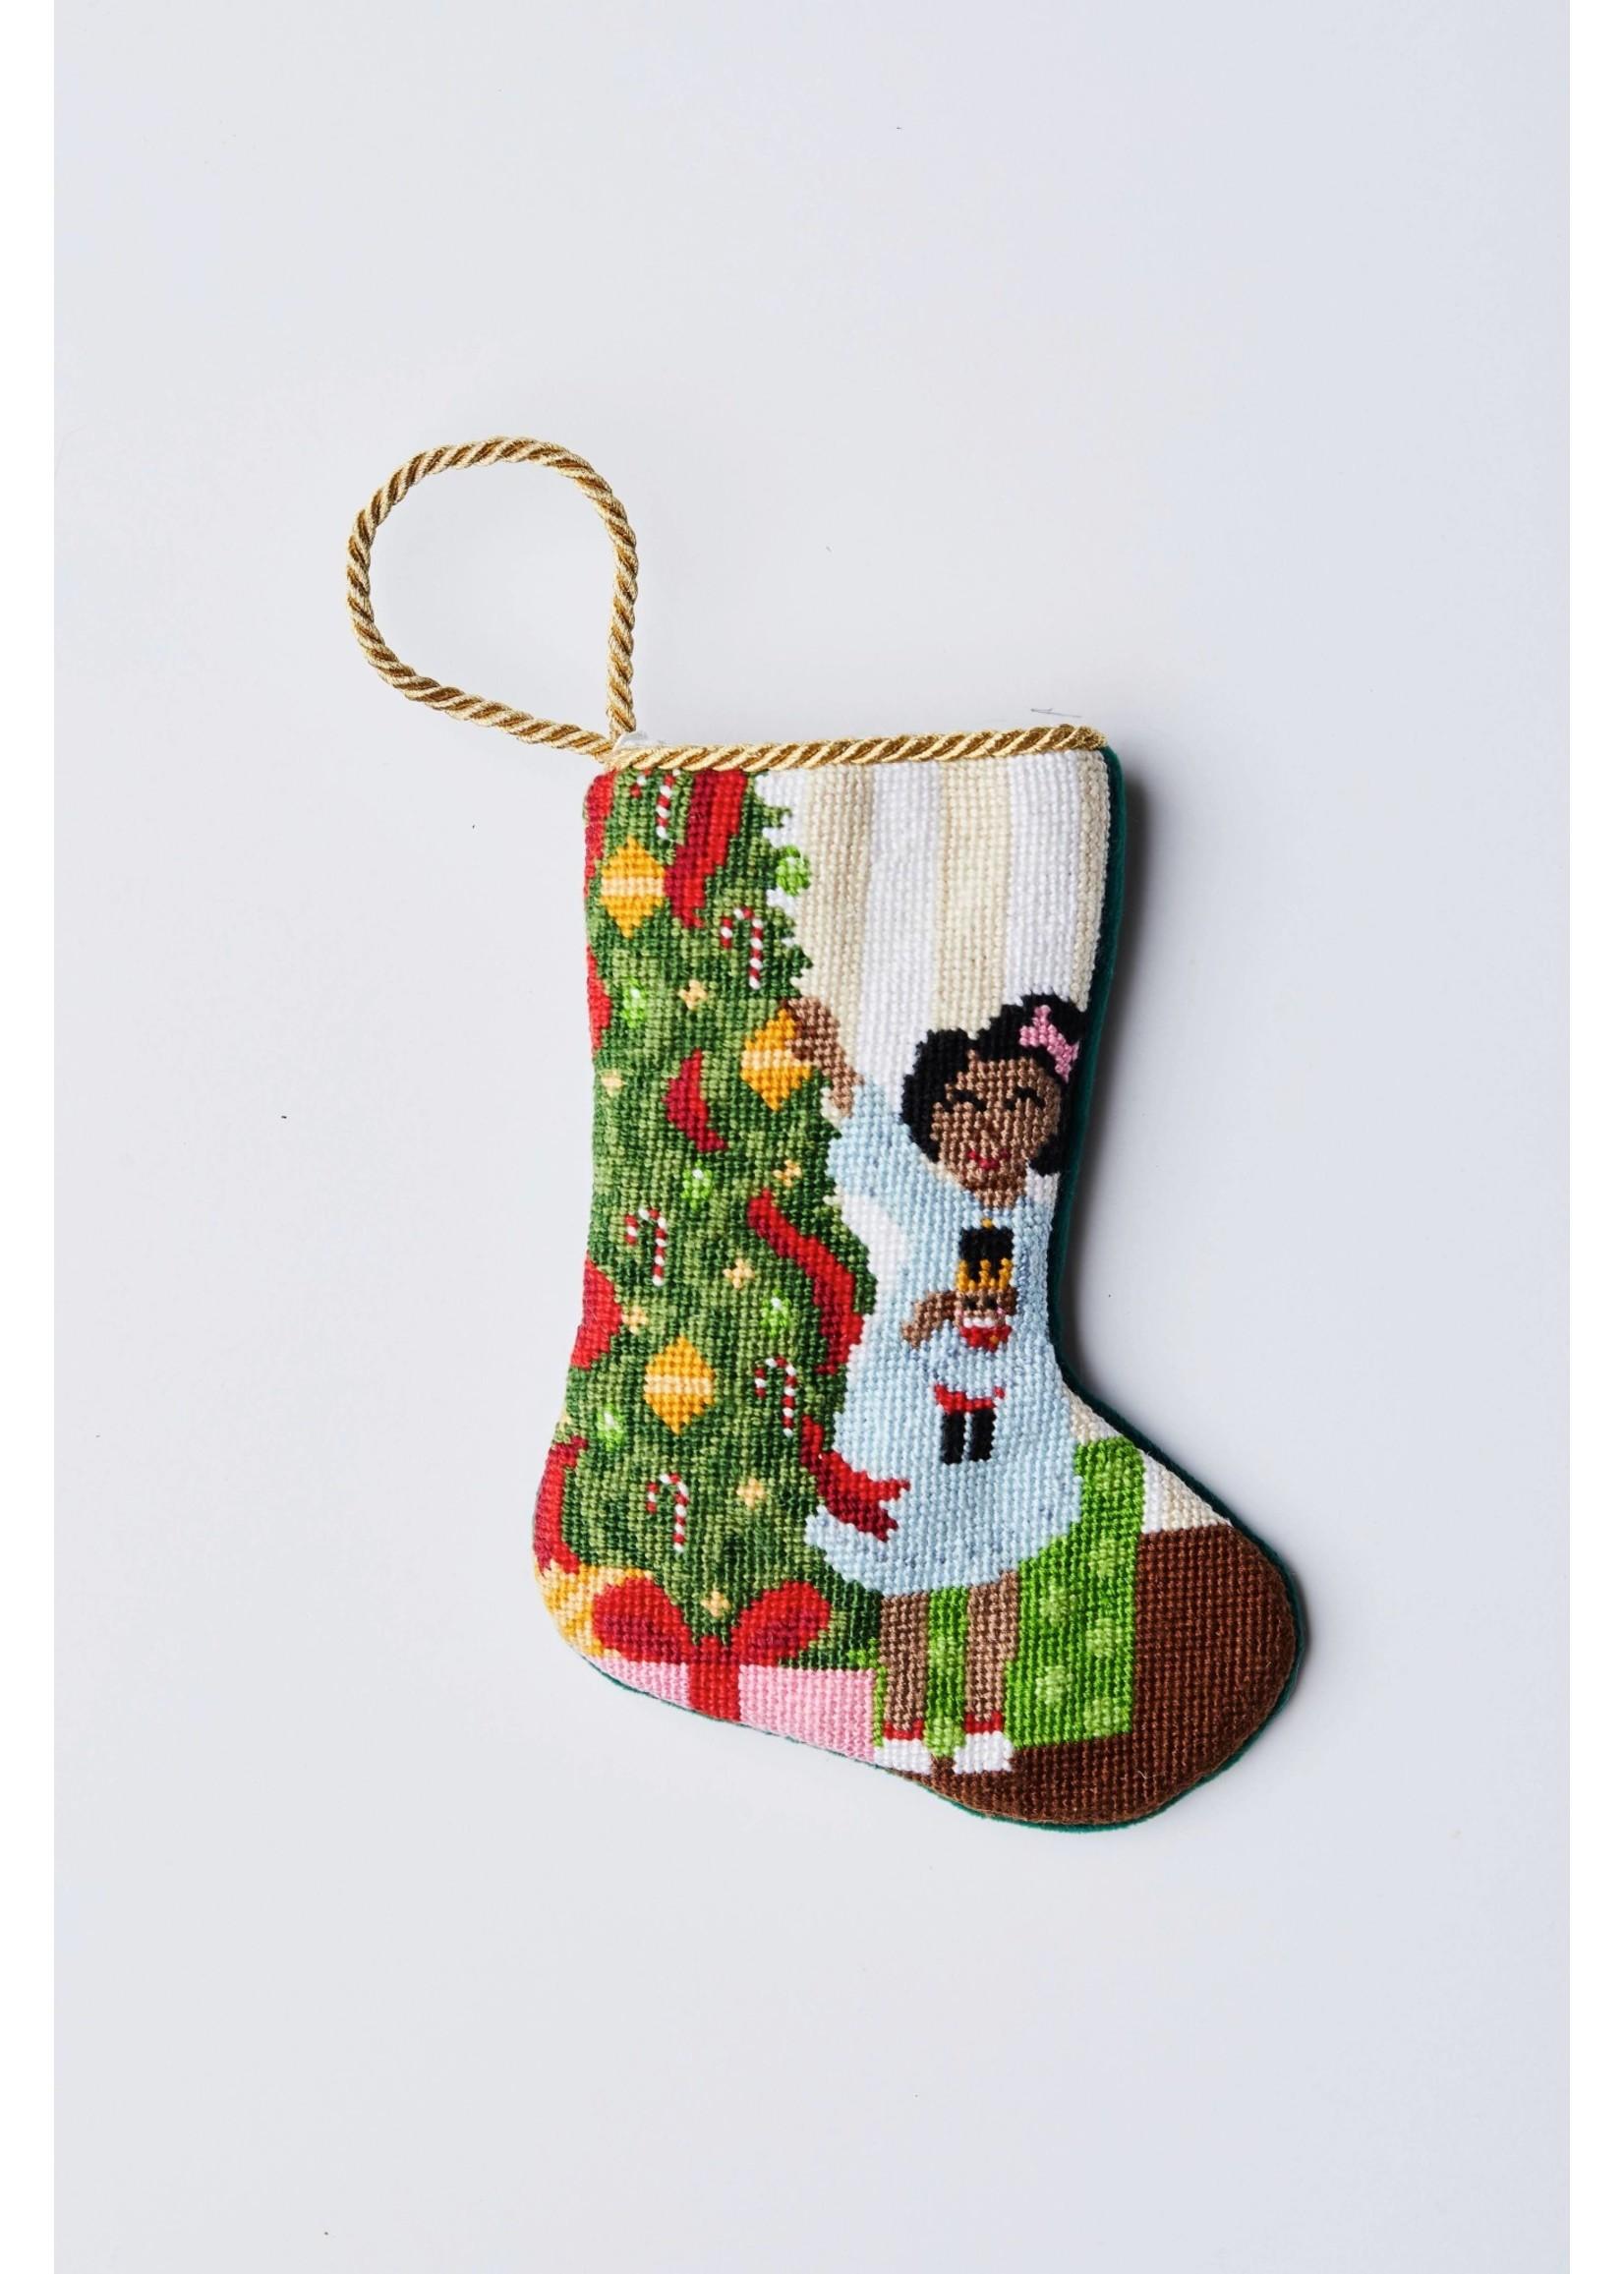 Bauble Stockings Bauble Stocking - Sugar Plum Dreaming